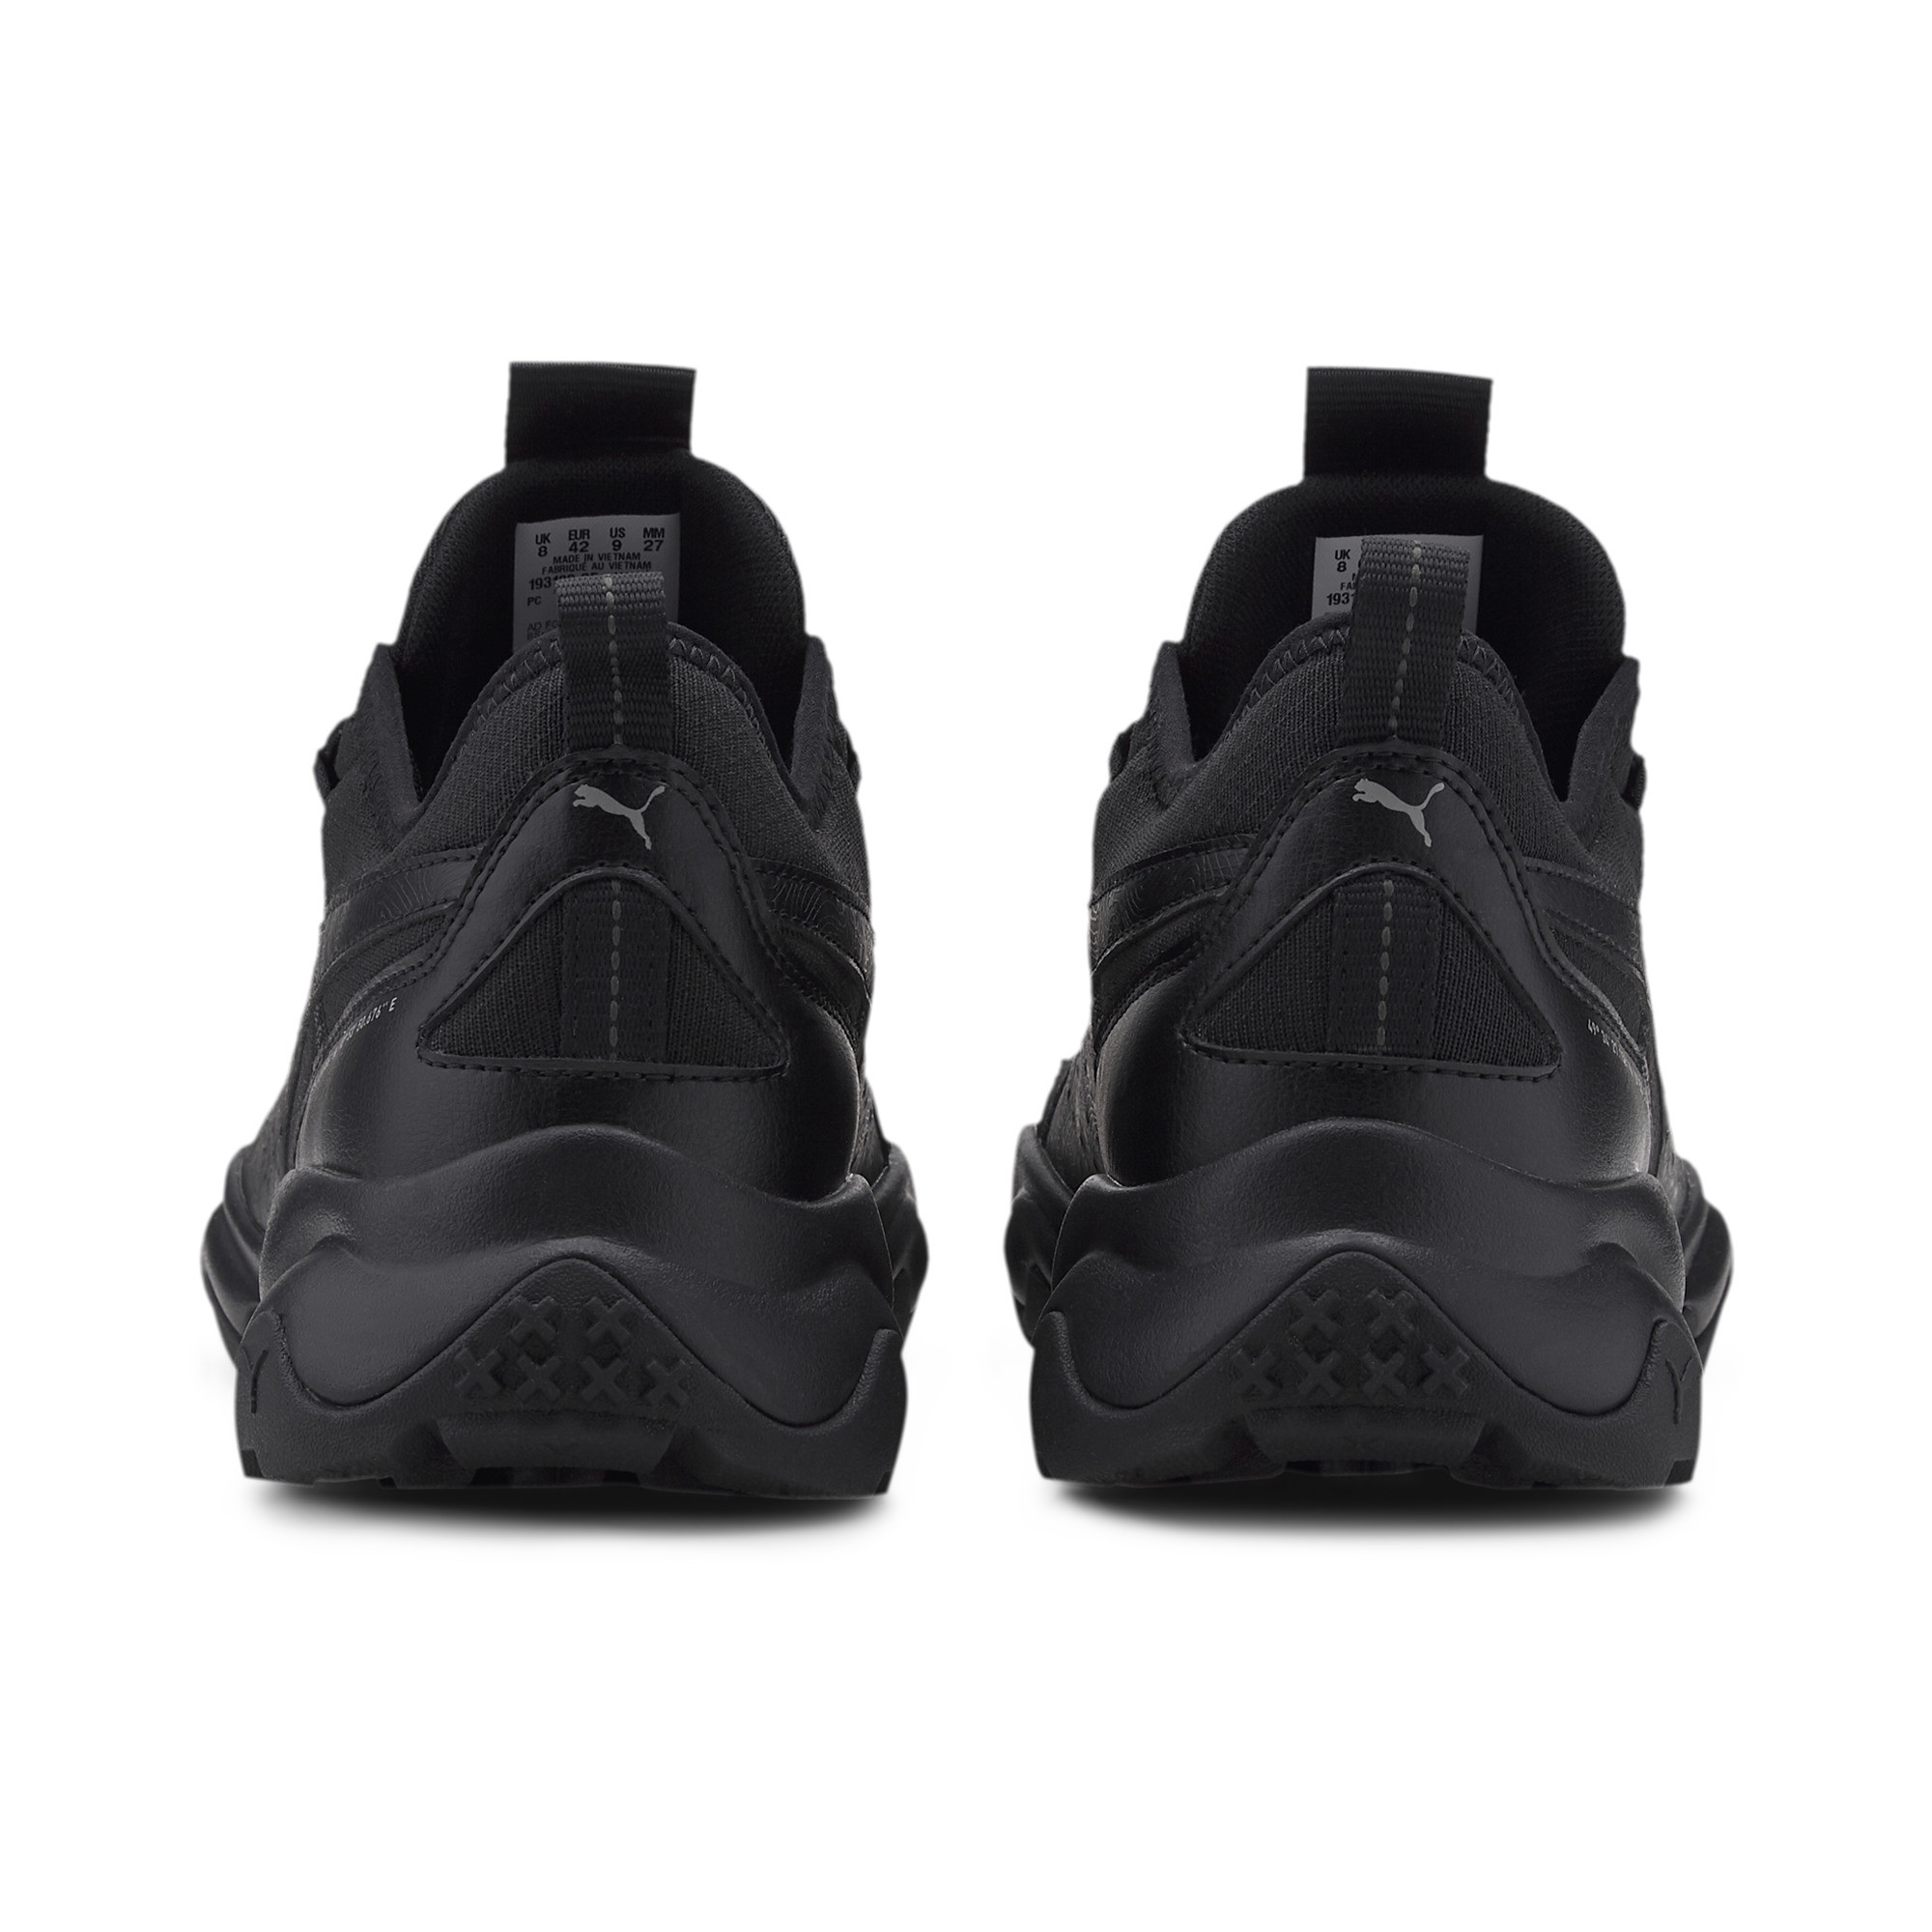 PUMA-Ember-Trail-Men-s-Running-Shoes-Men-Shoe-Running thumbnail 7